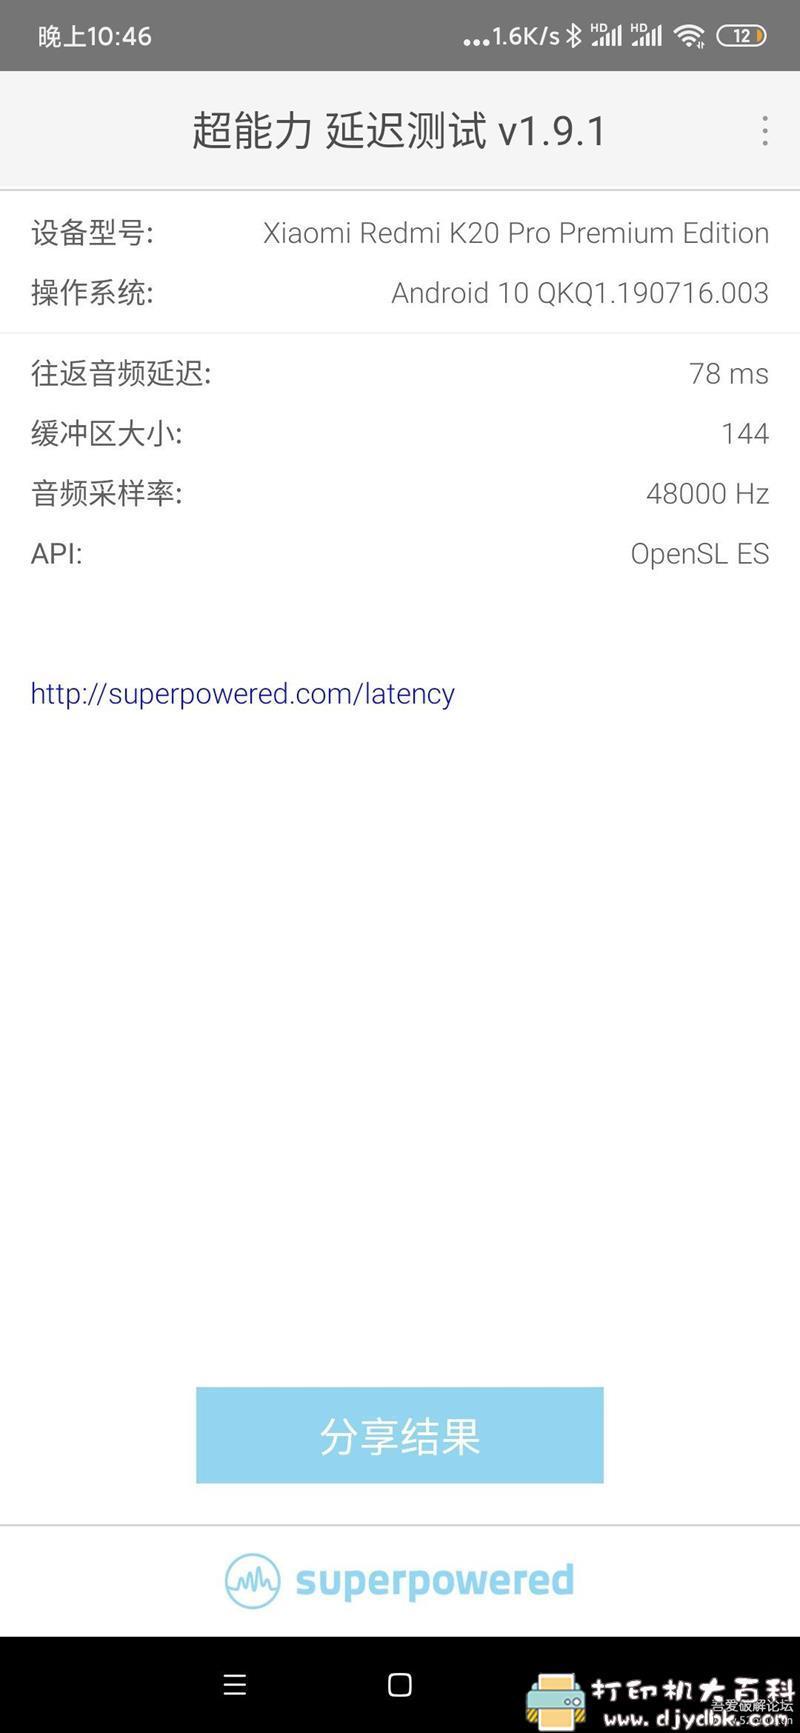 [Android]蓝牙耳机延迟测试软件:Latency Test 1.9.1-221454+汉化版图片 No.2